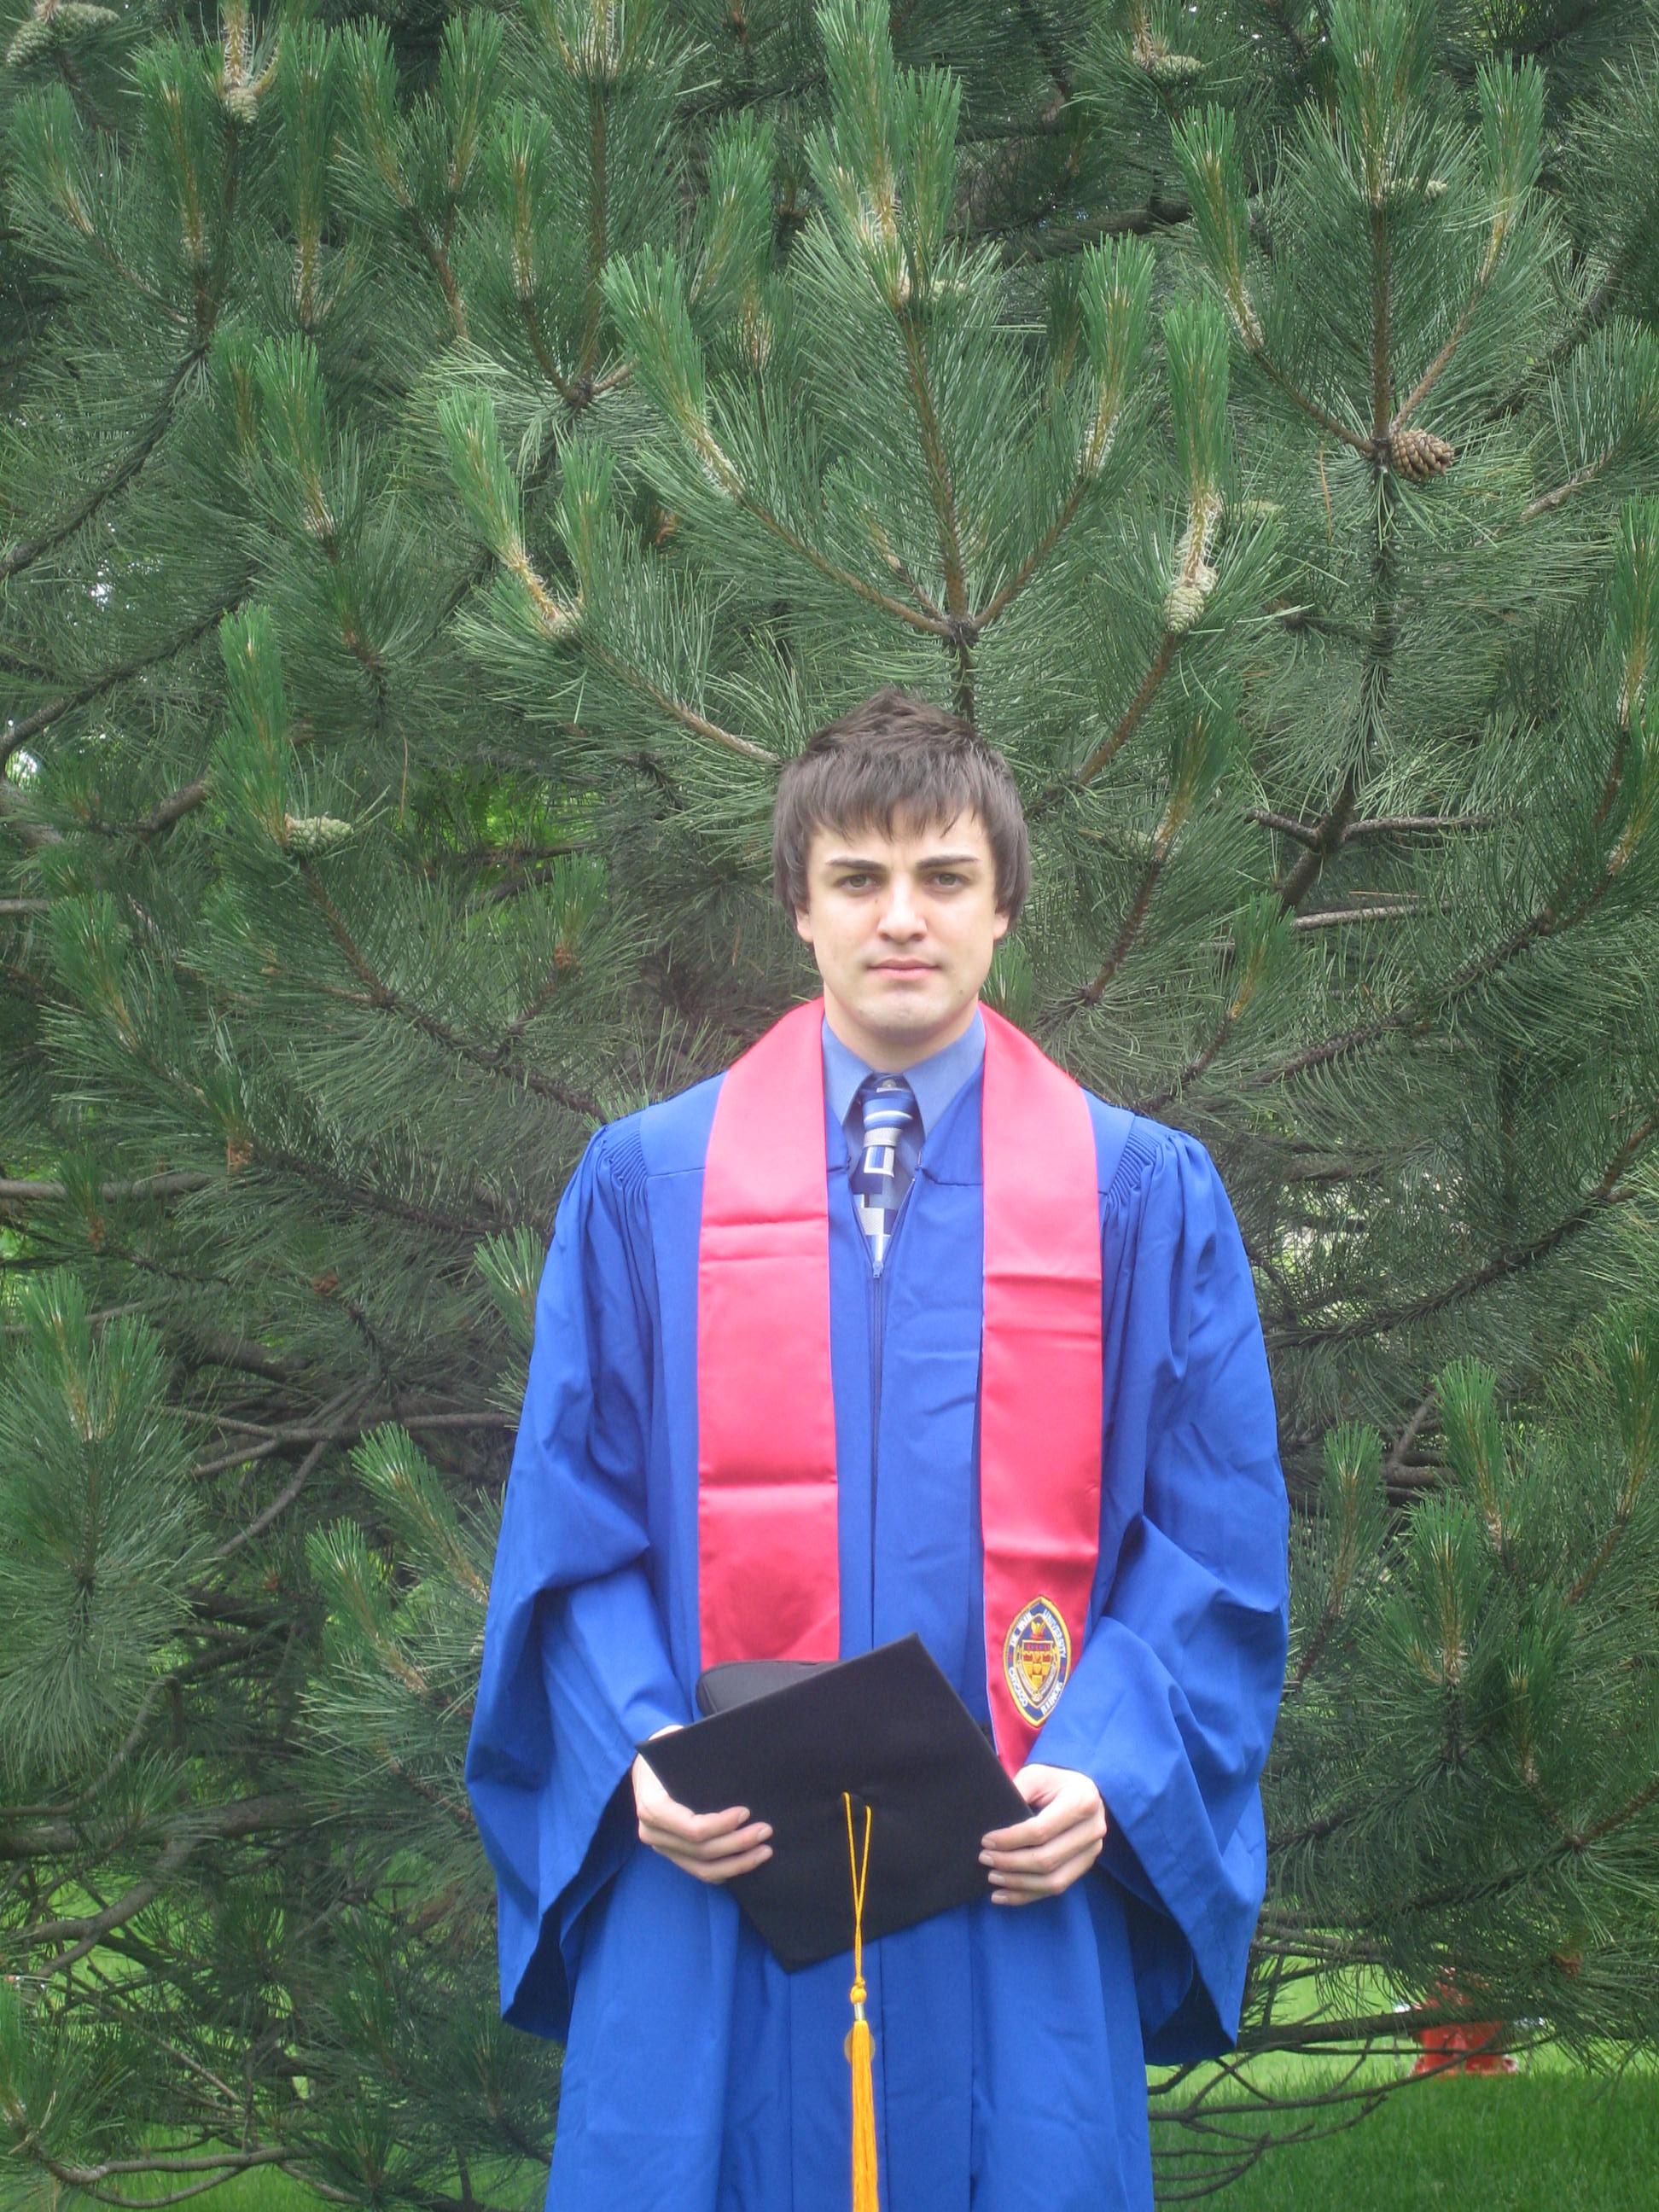 Светлин Радев завърши Чикагския университет с отличие и започна в Кралската шотландска банка